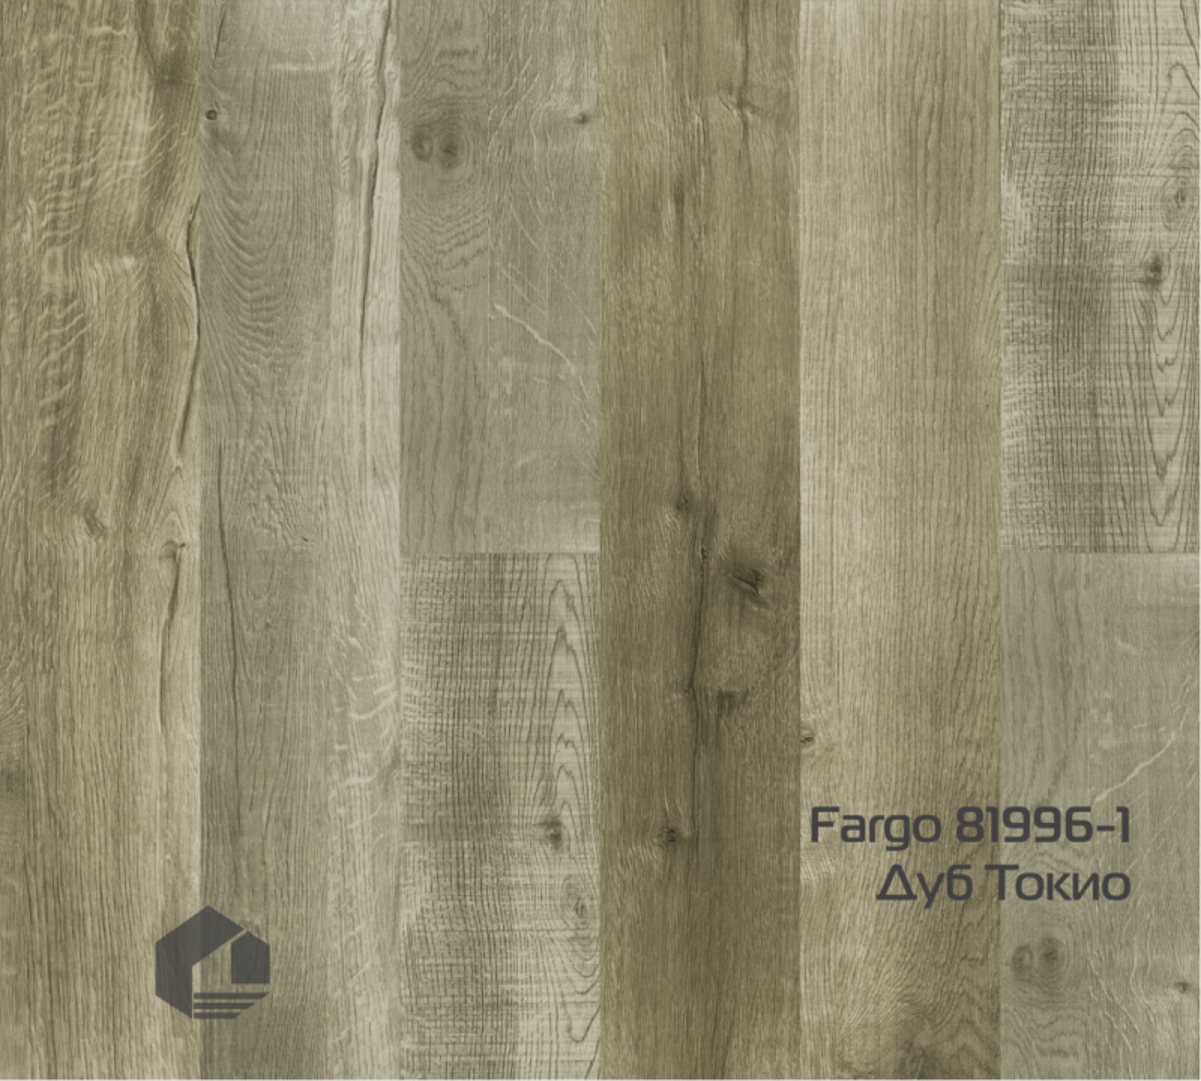 Кварцевый ламинат Fargo Classic 81996-1